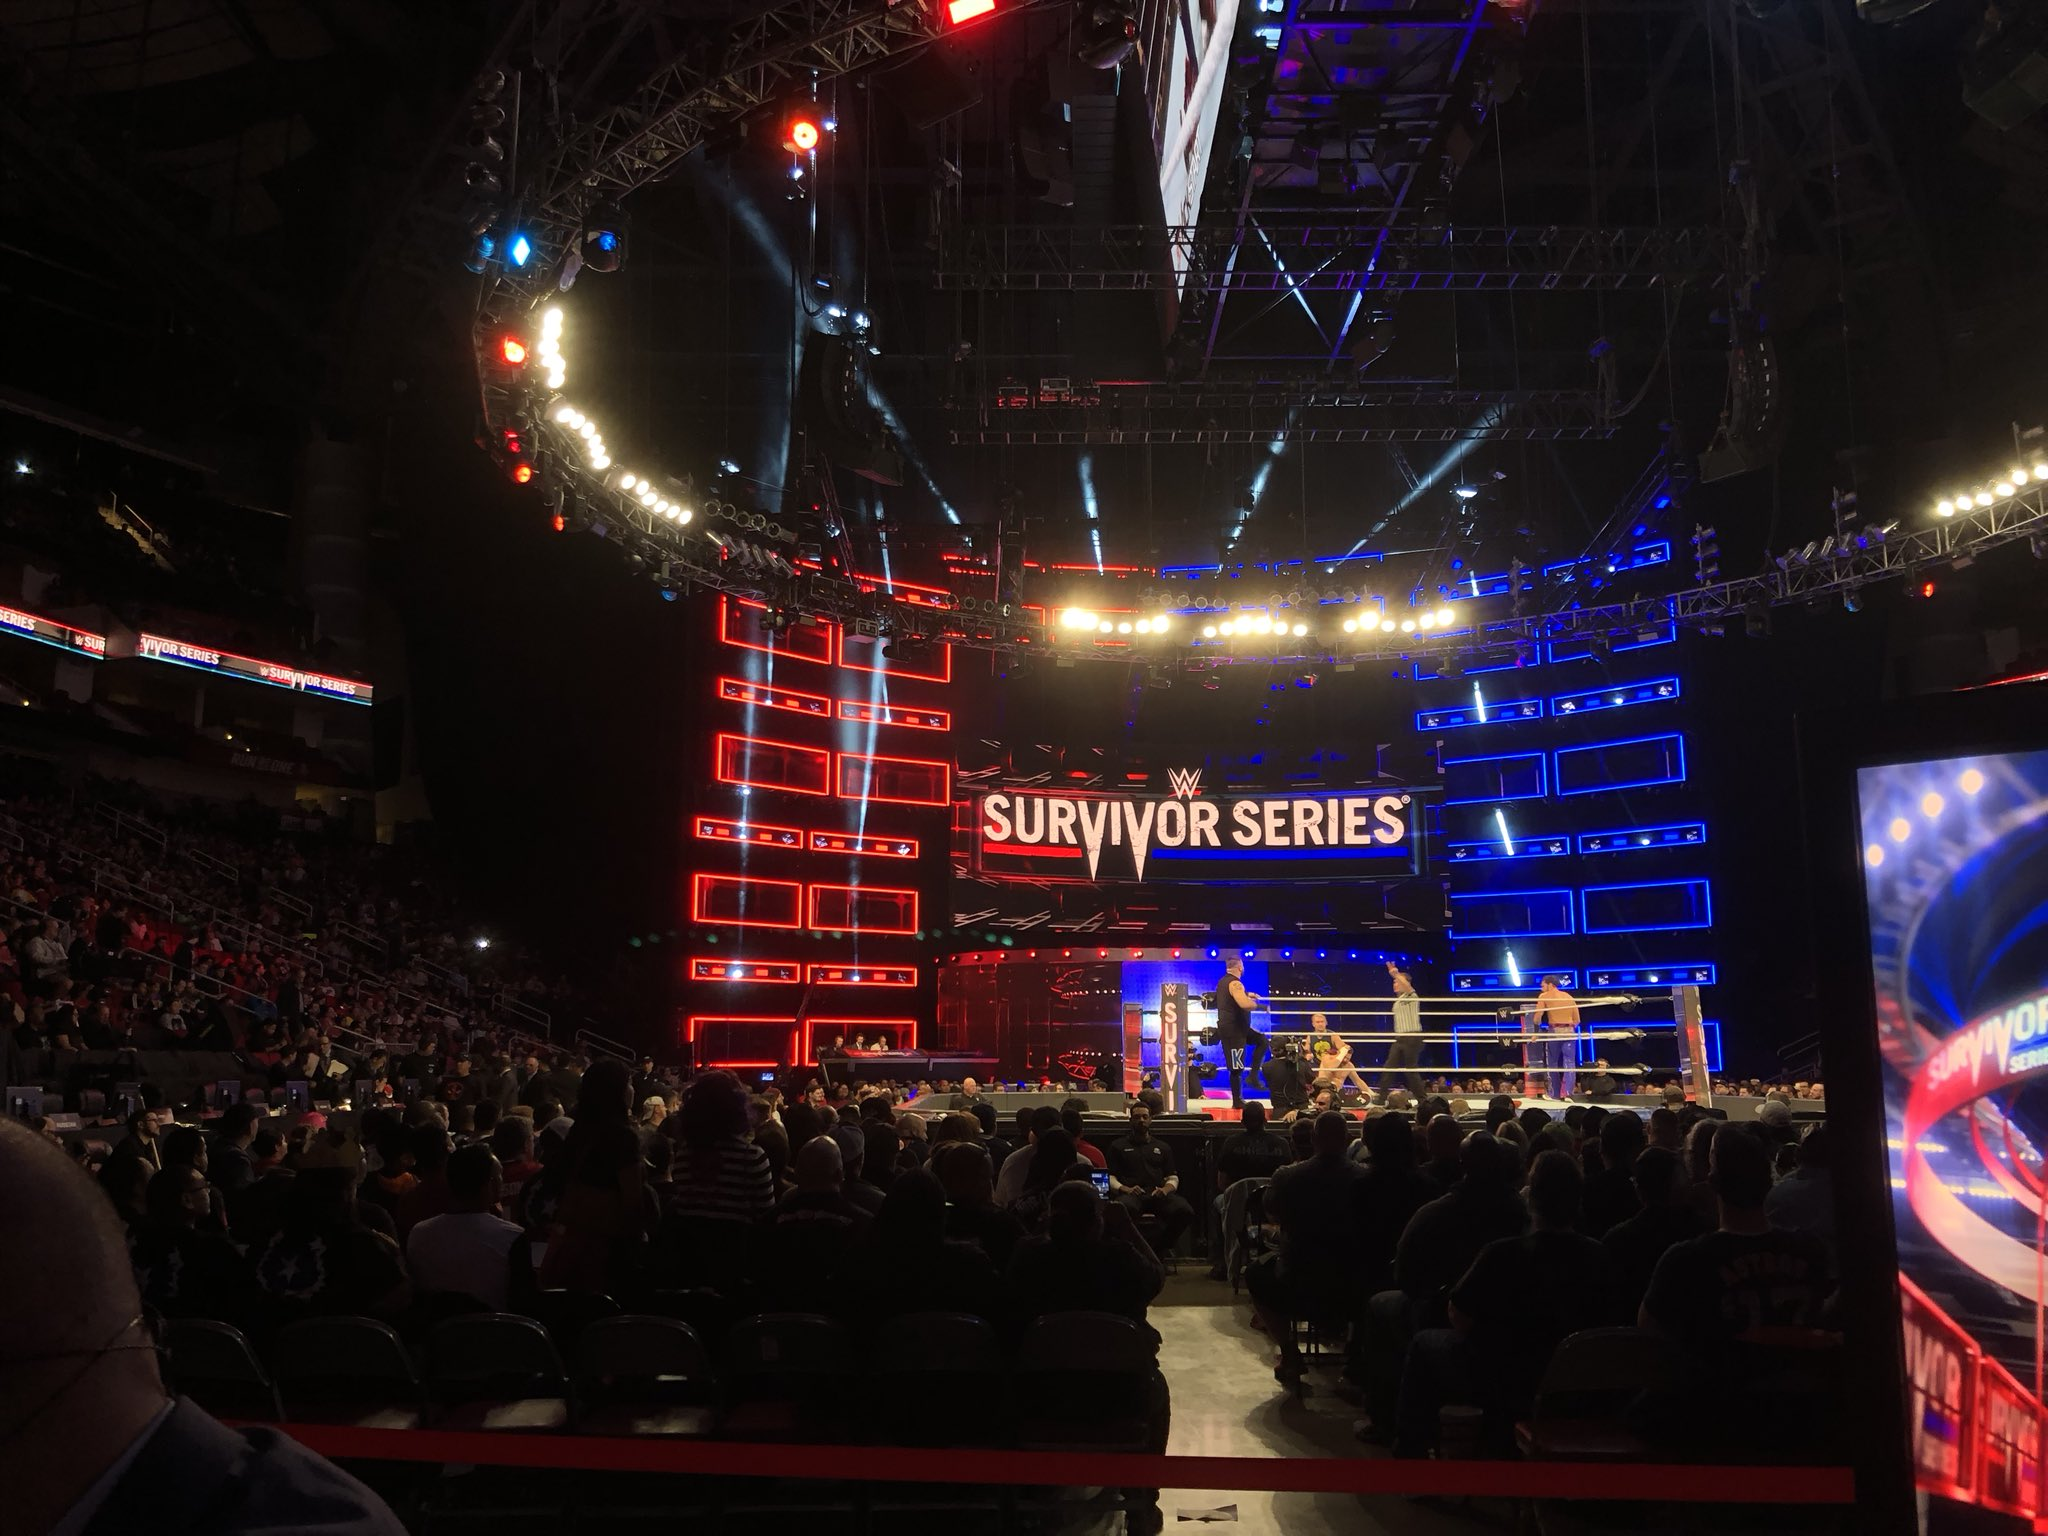 Gotta say, this Pre-Show gig get's ya a pretty good view!!! #SurvivorSeries https://t.co/wkXPjGIirY